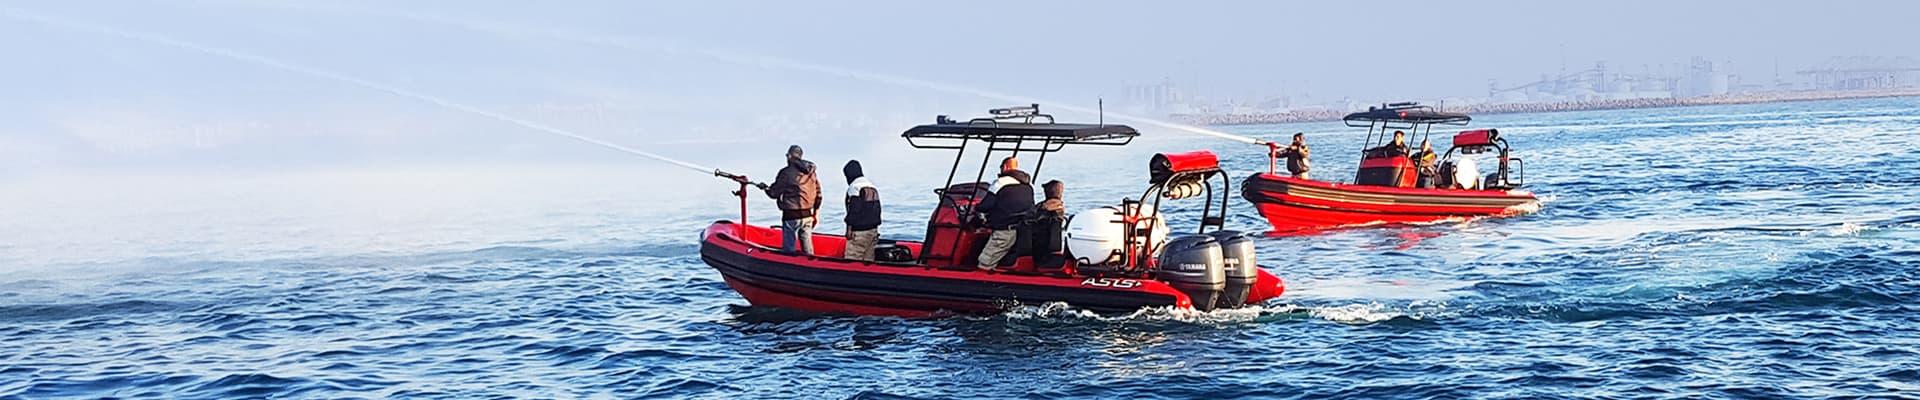 firefighting-boat